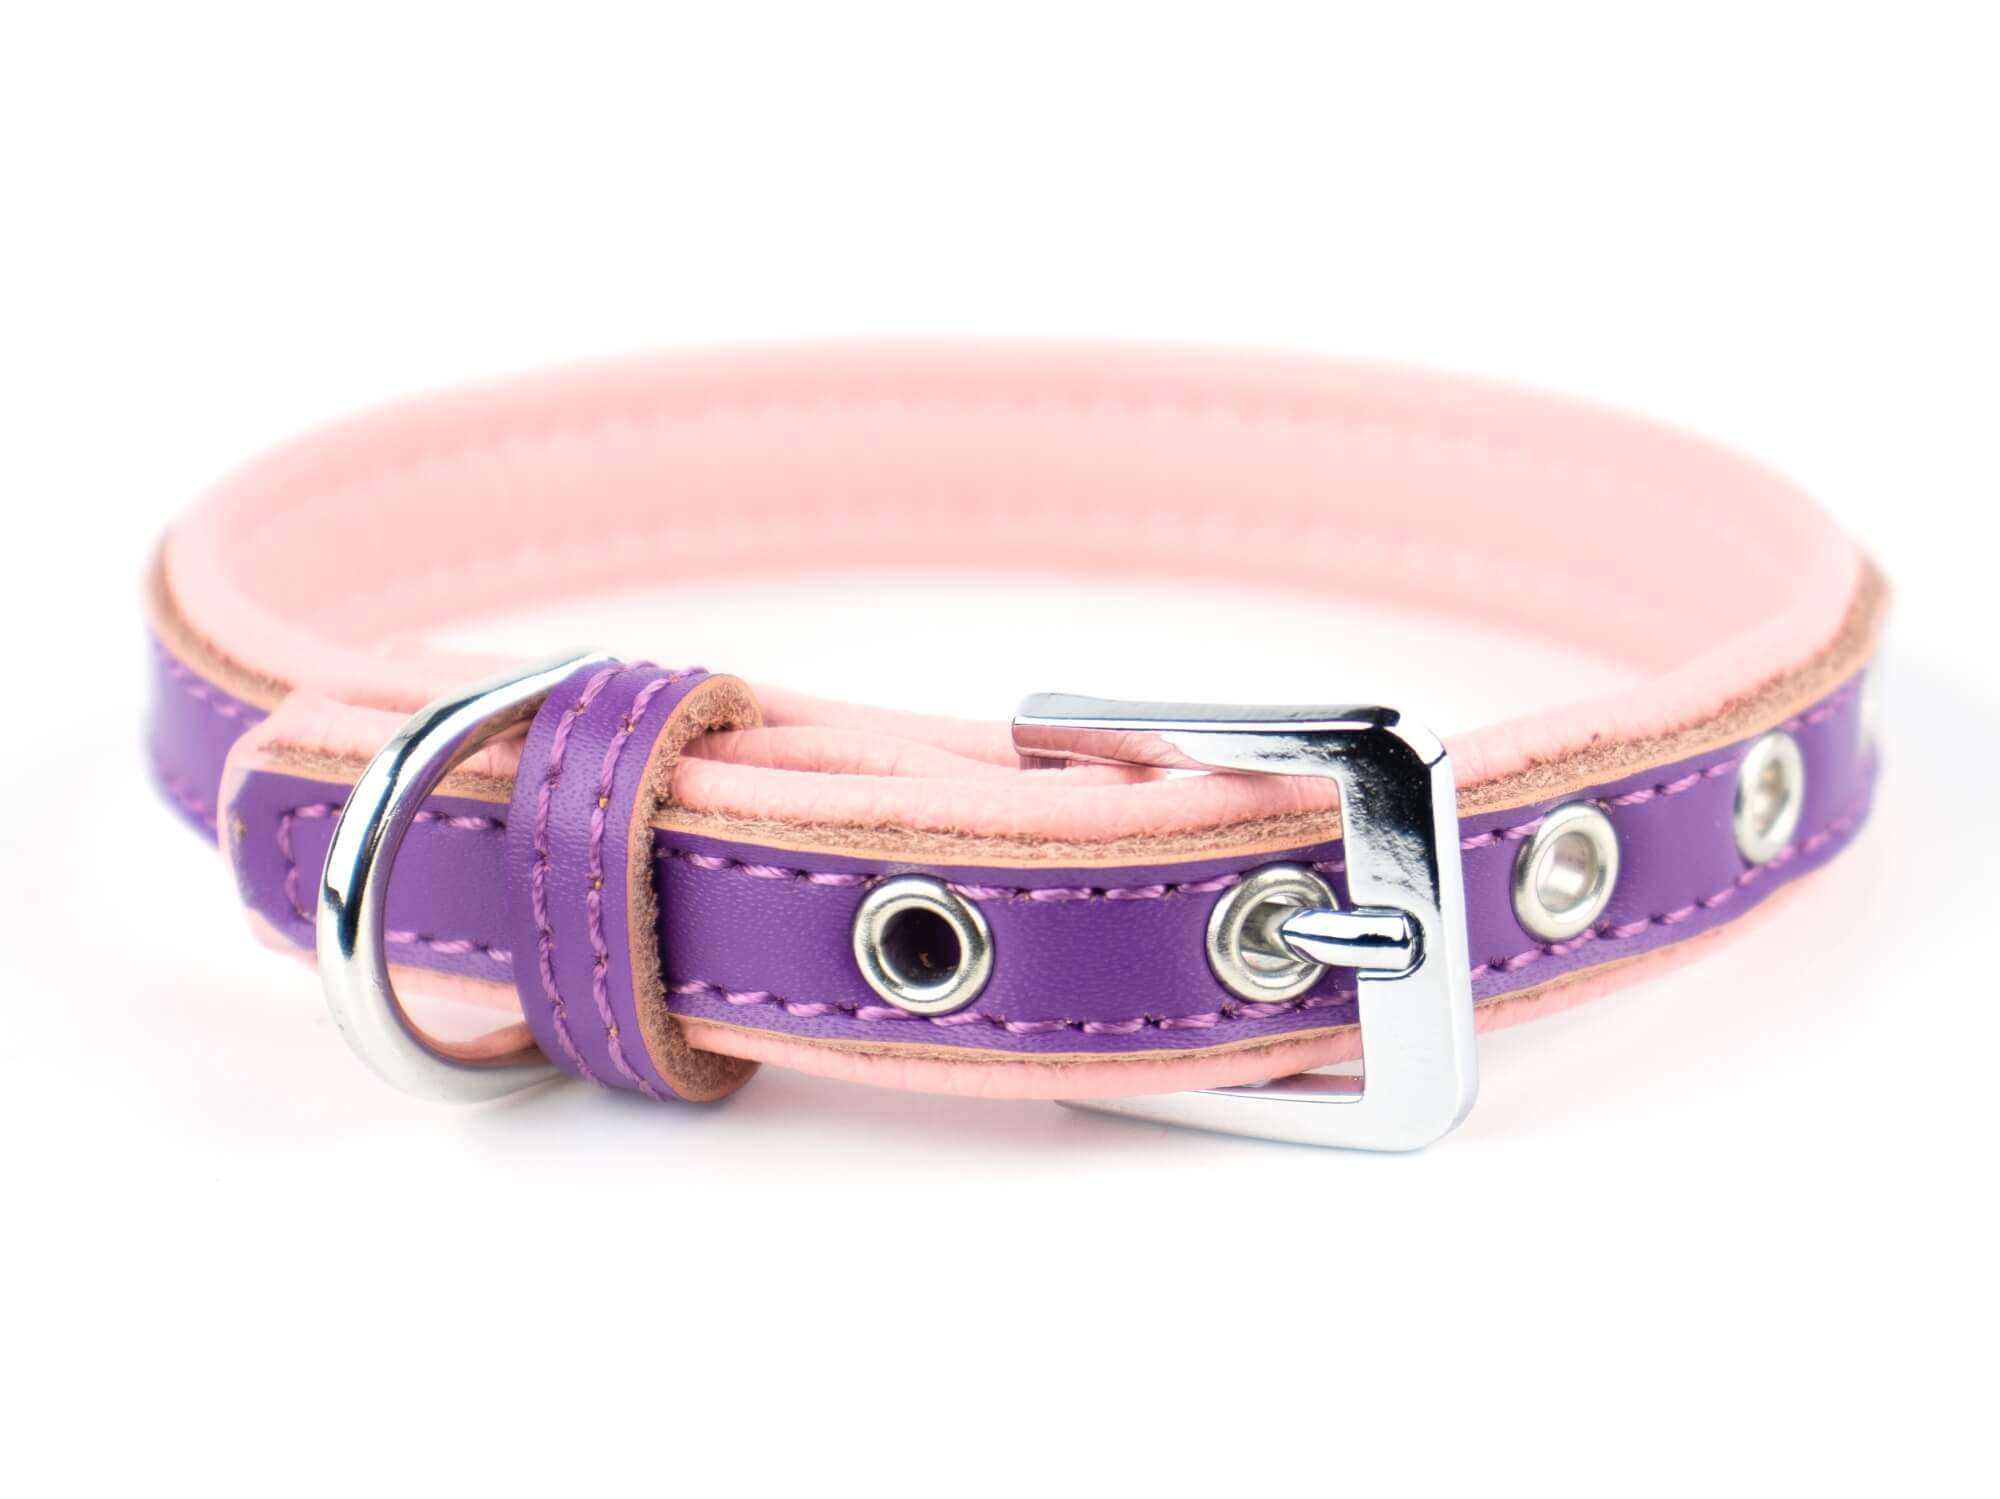 Vsepropejska Rose obojek pro psa | 22 - 34 cm Barva: Fialovo-růžová, Obvod krku: 22 - 27 cm